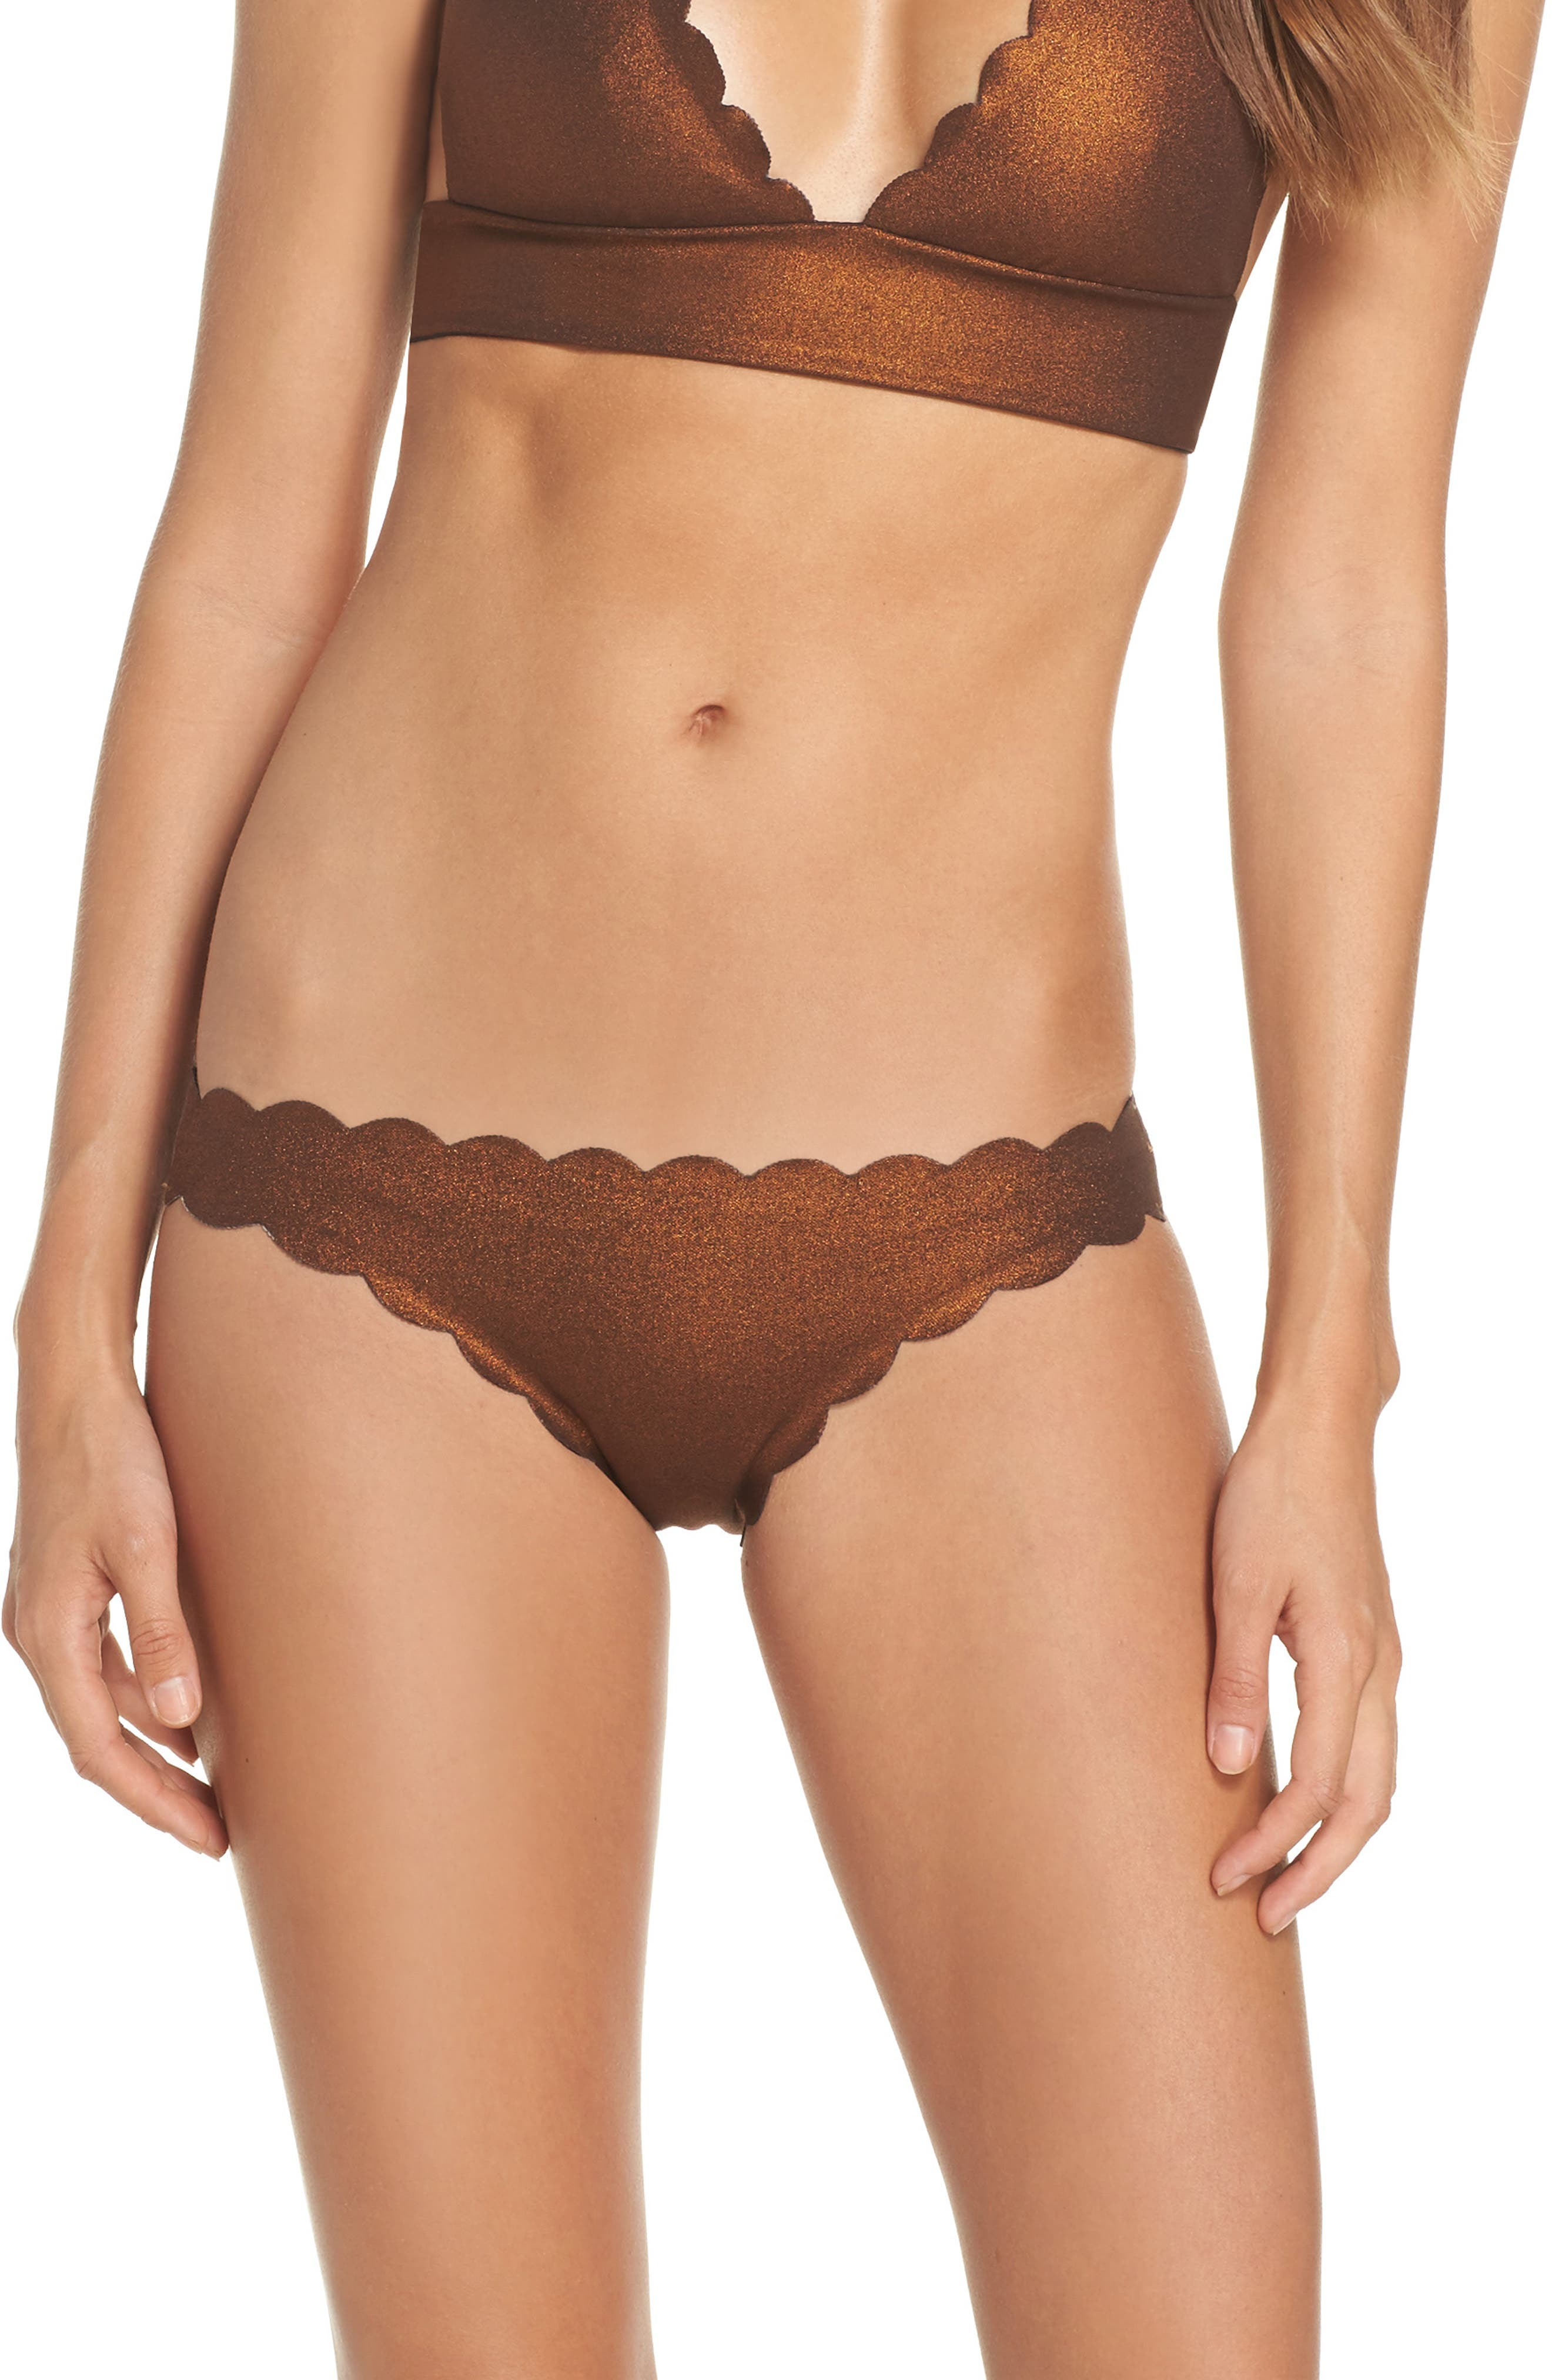 Main Image - PilyQ Wave Reversible Seamless Bikini Bottoms